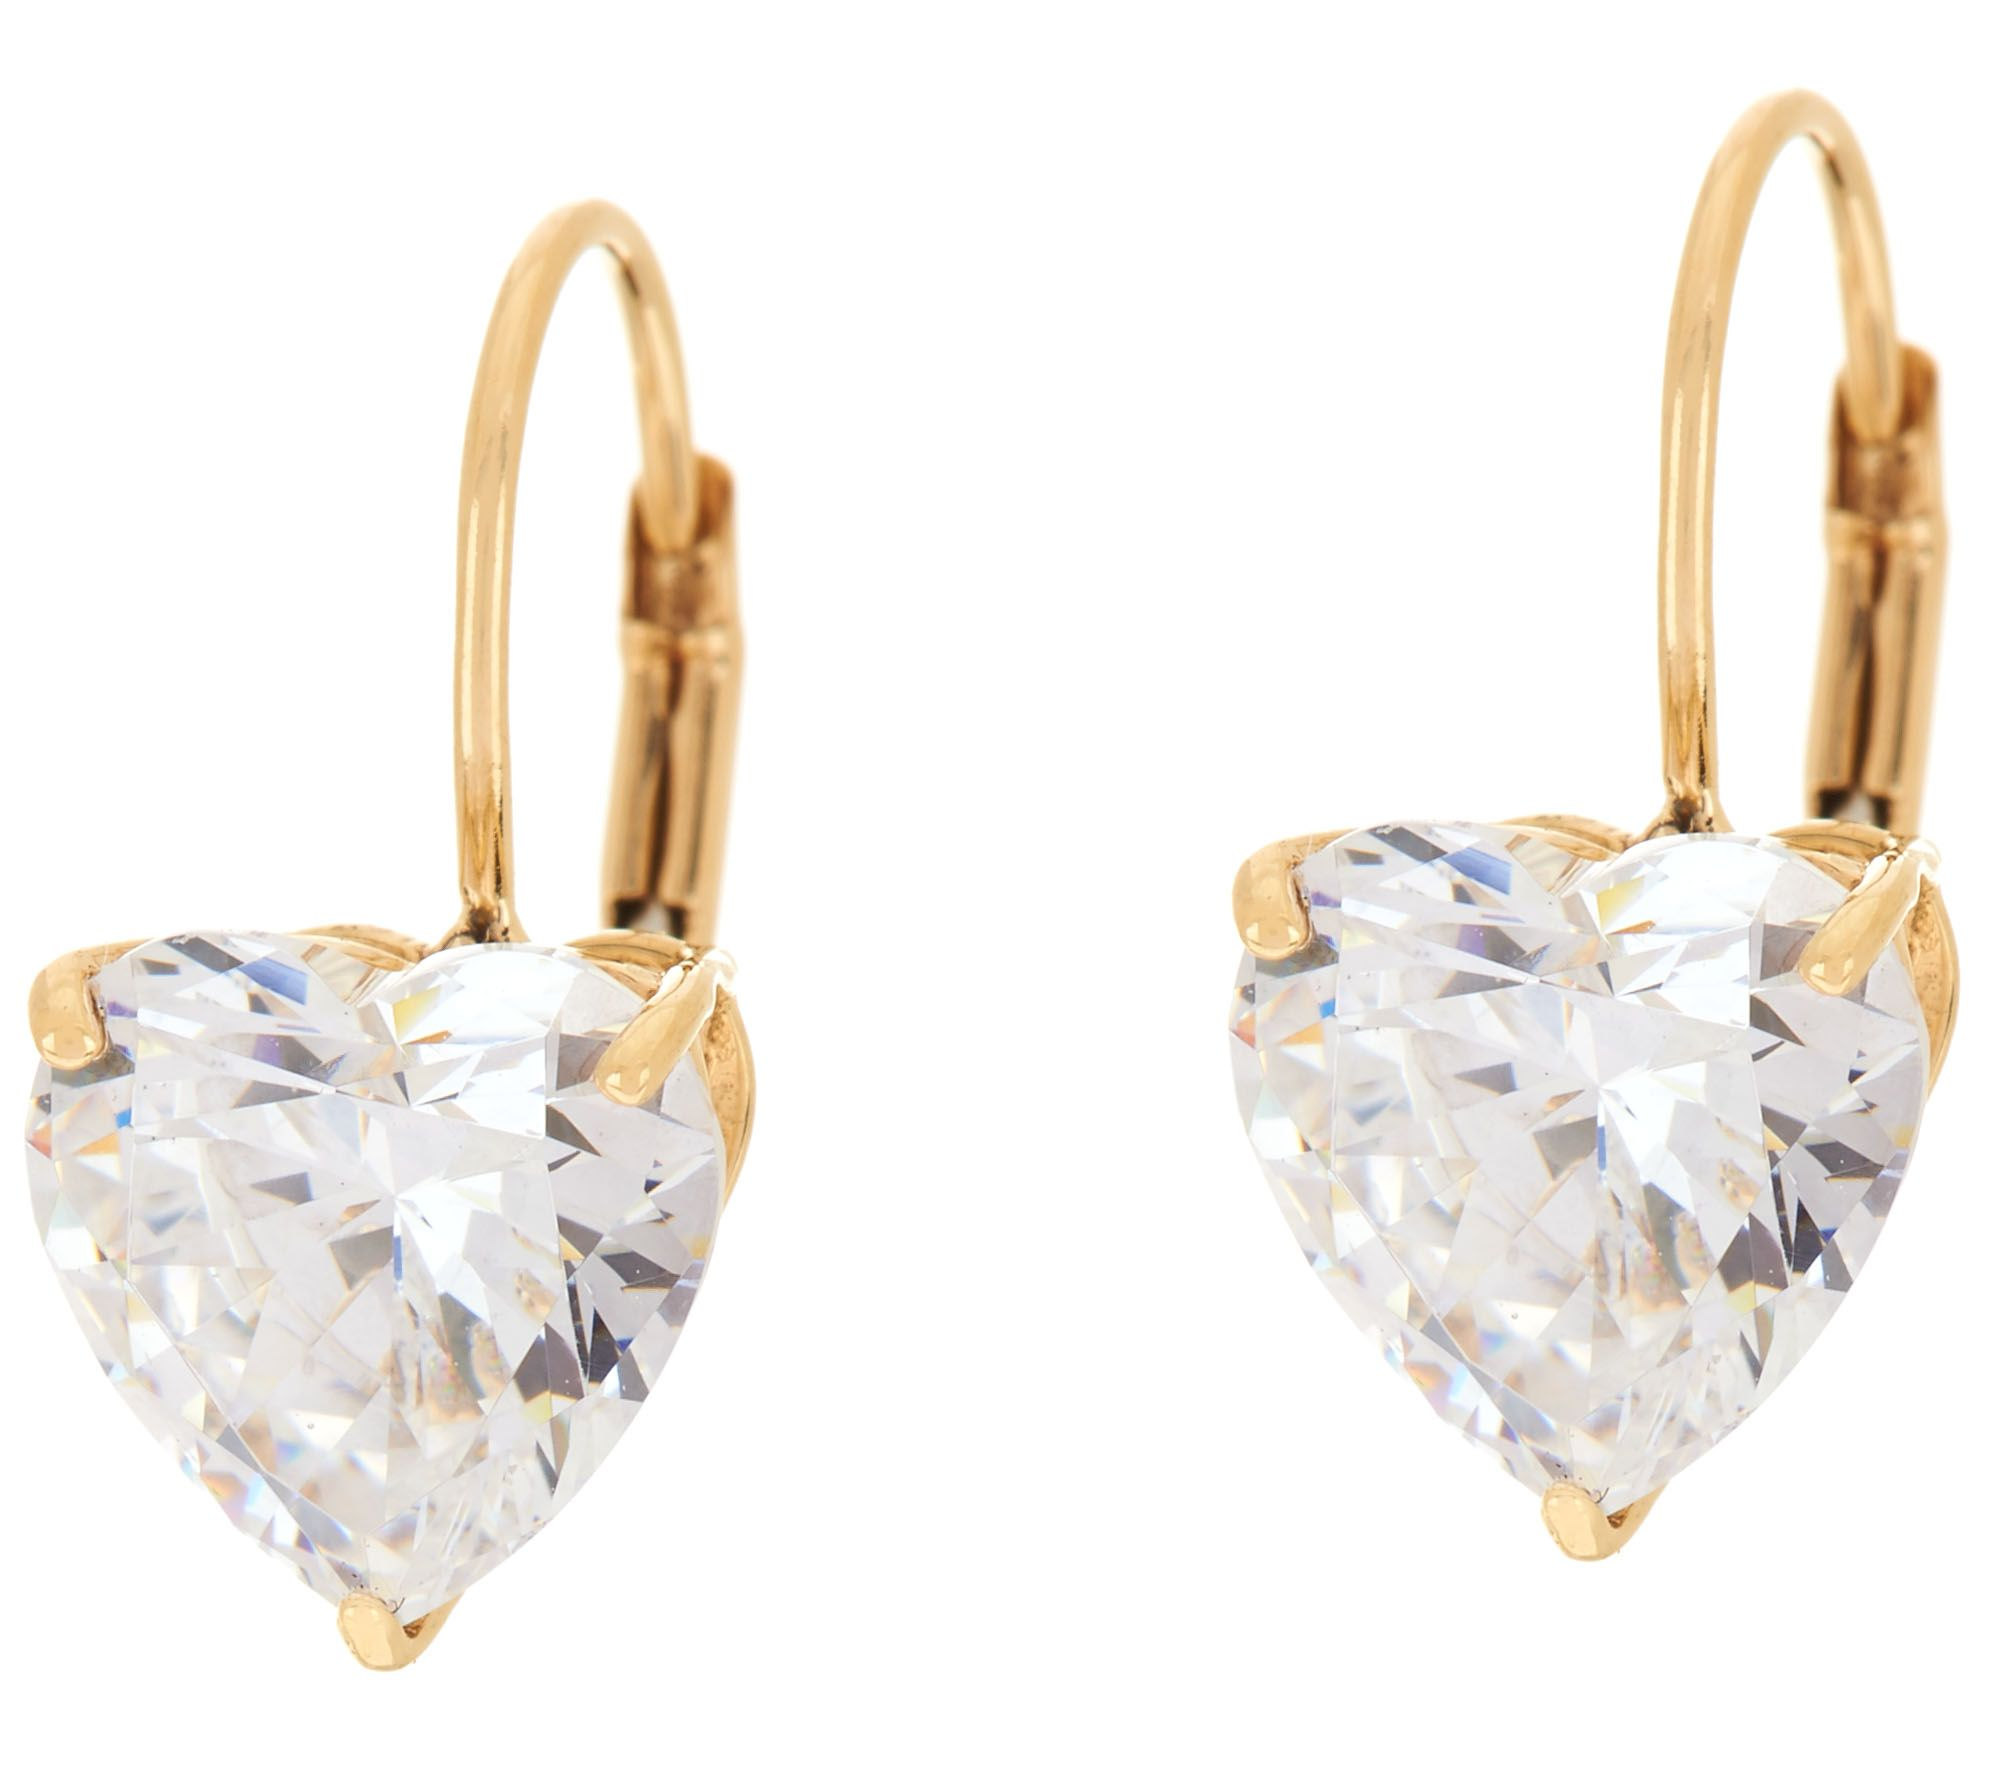 Diamonique 4 00 cttw Heart Leverback Earrings 14K Gold Page 1